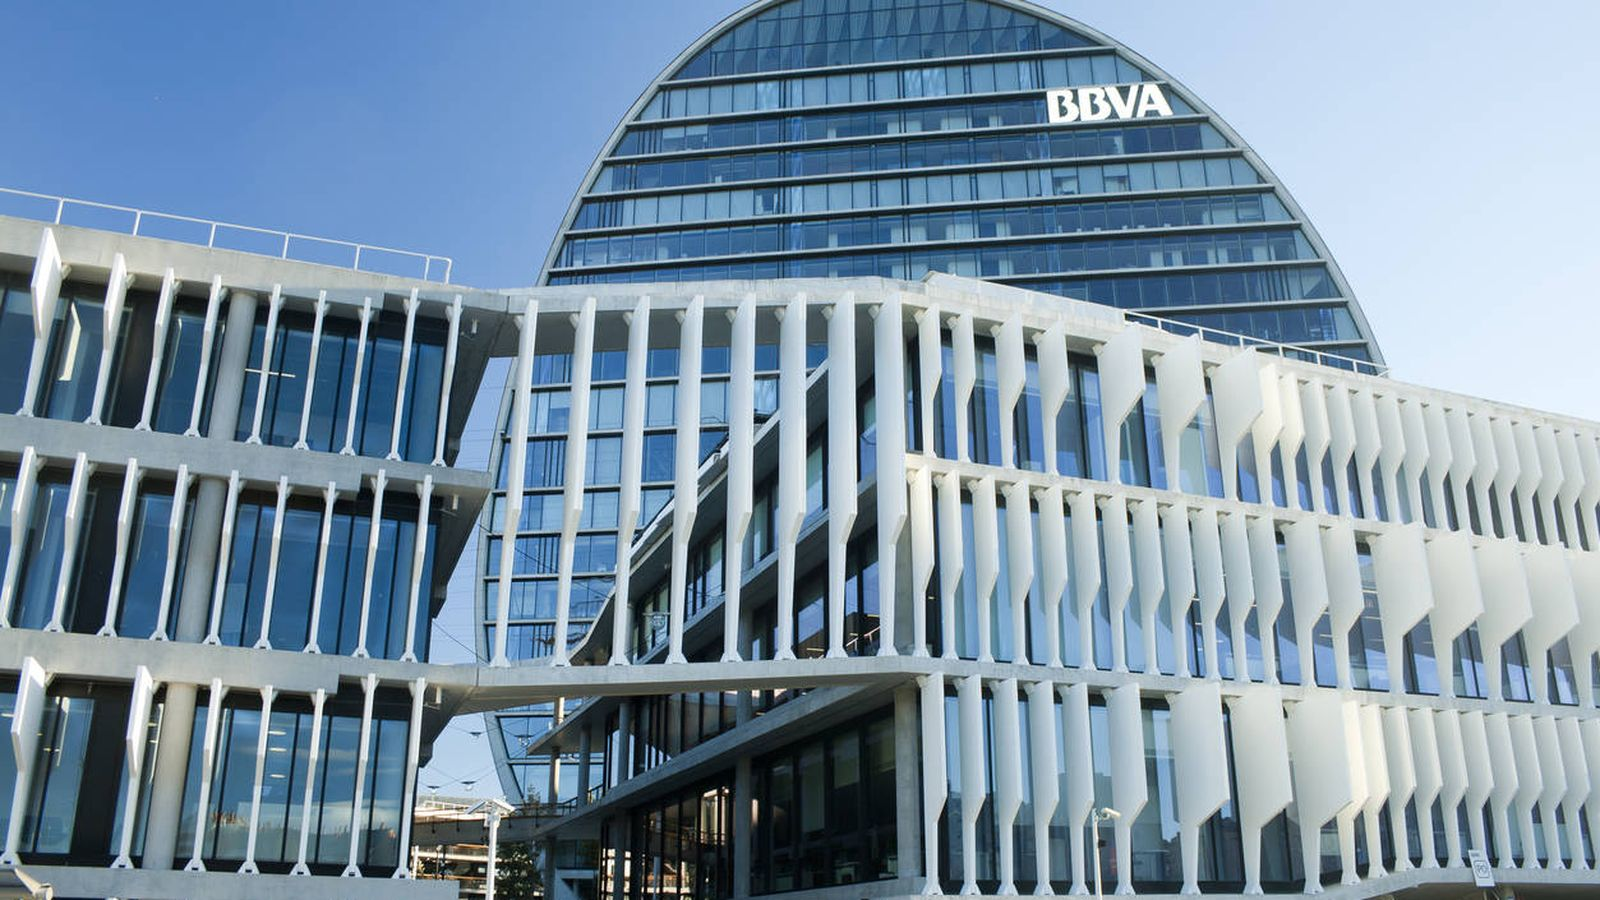 Foto: Sede de BBVA en Madrid. (iStock)